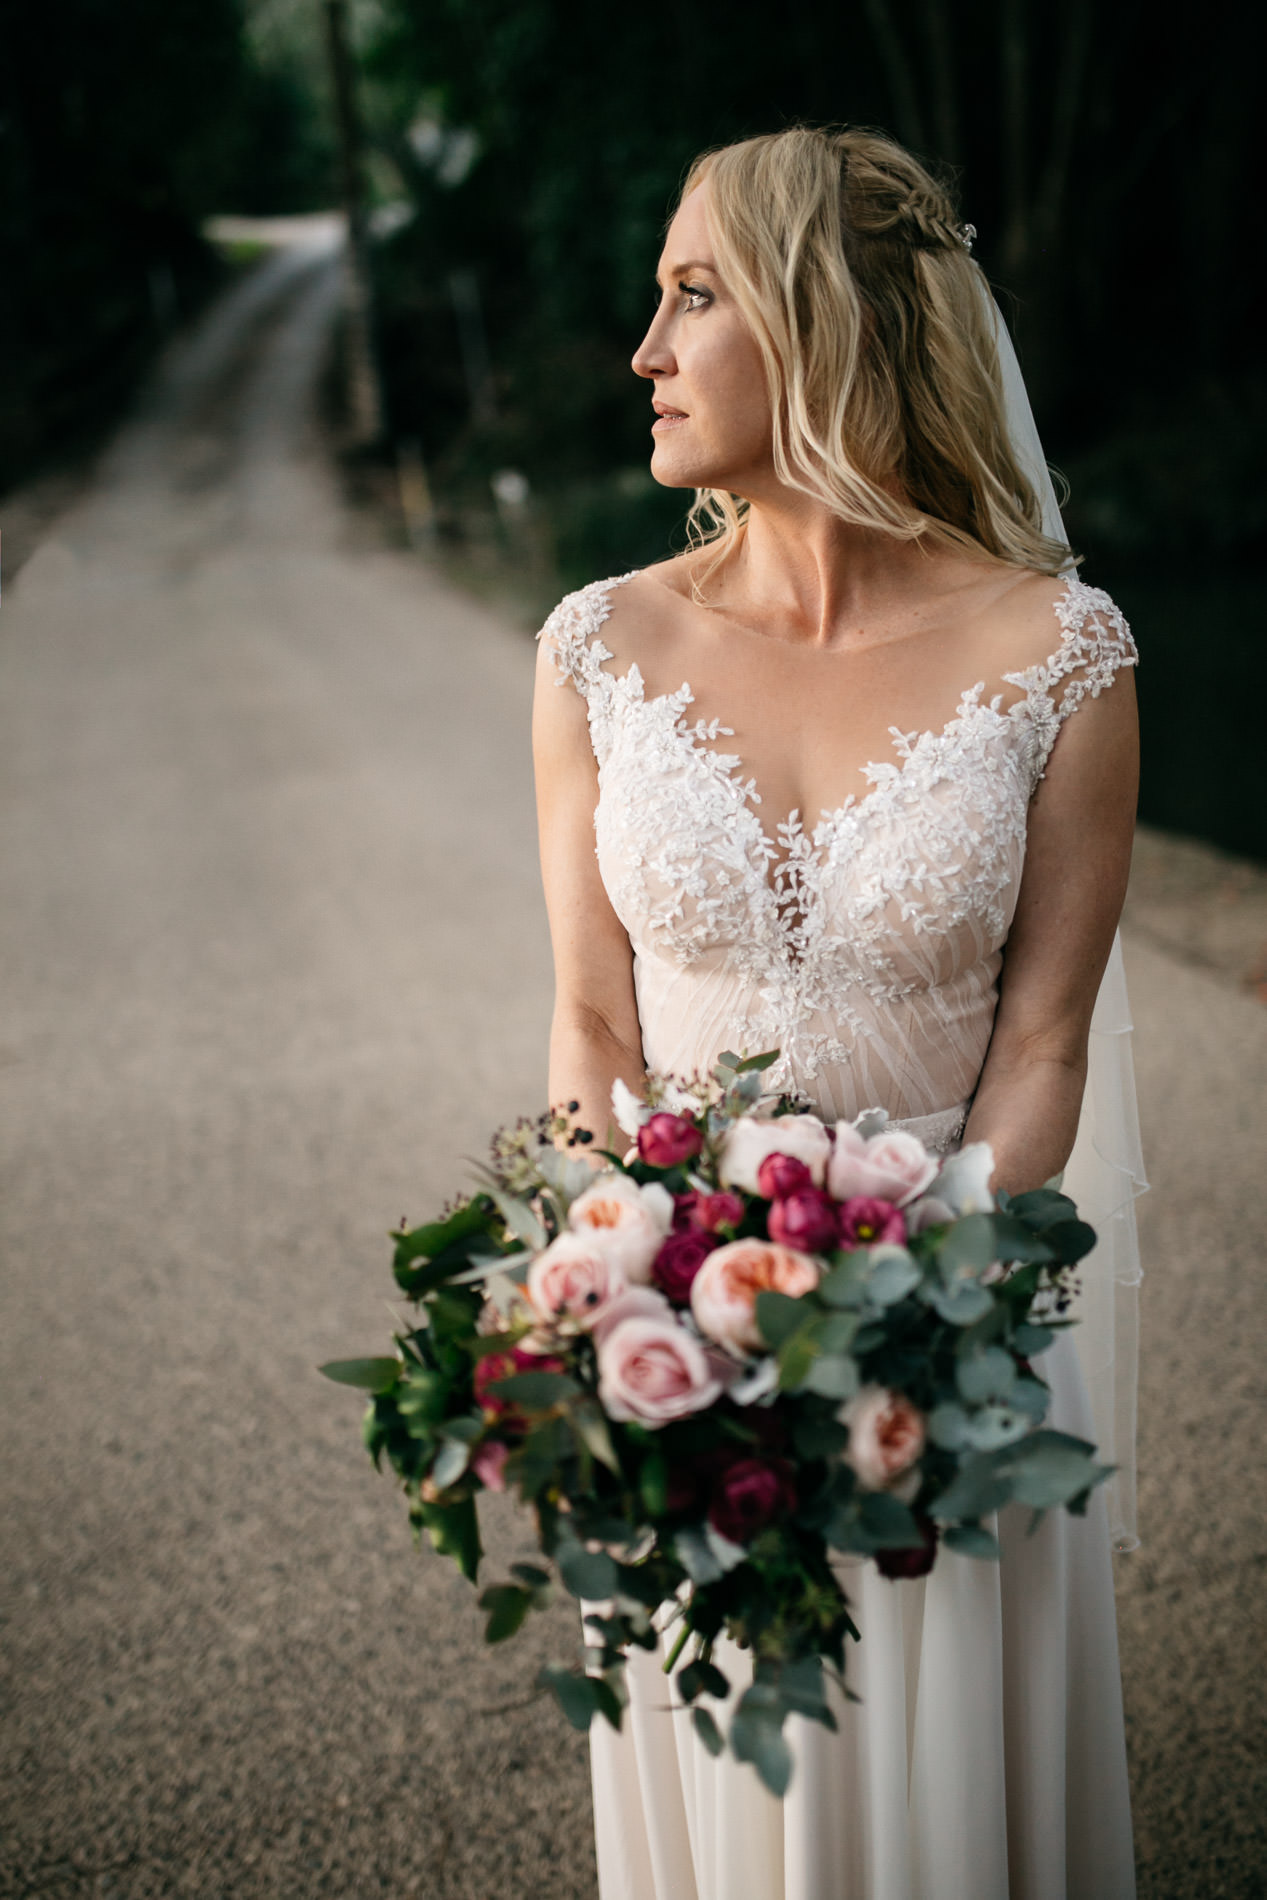 True North Photography_Boomerang Farm_Stacey and Isaac_Gold Coast Wedding_Barm Wedding_Hinterland Wedding-152.jpg